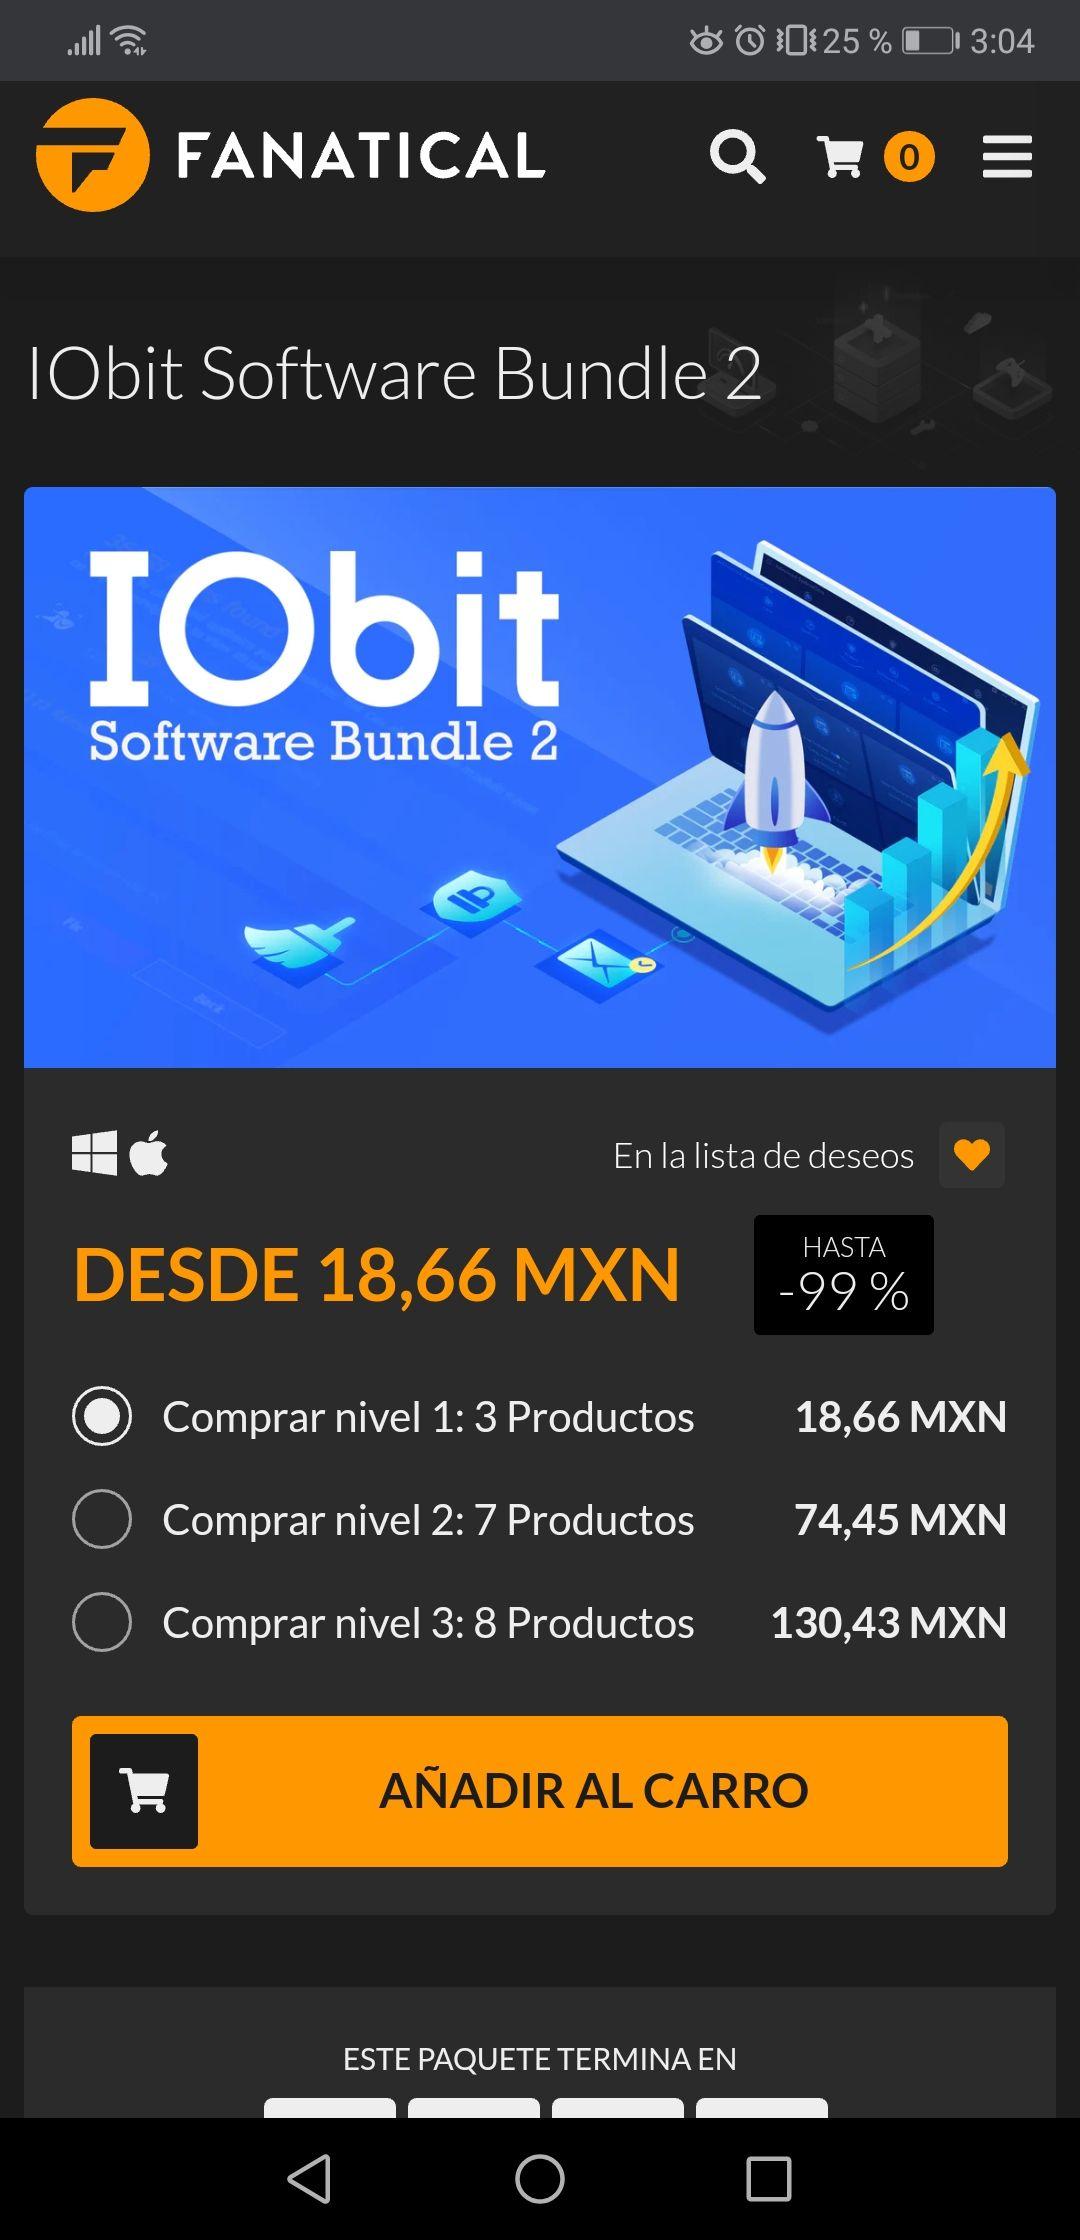 Fanatical IObit Software Bundle 2